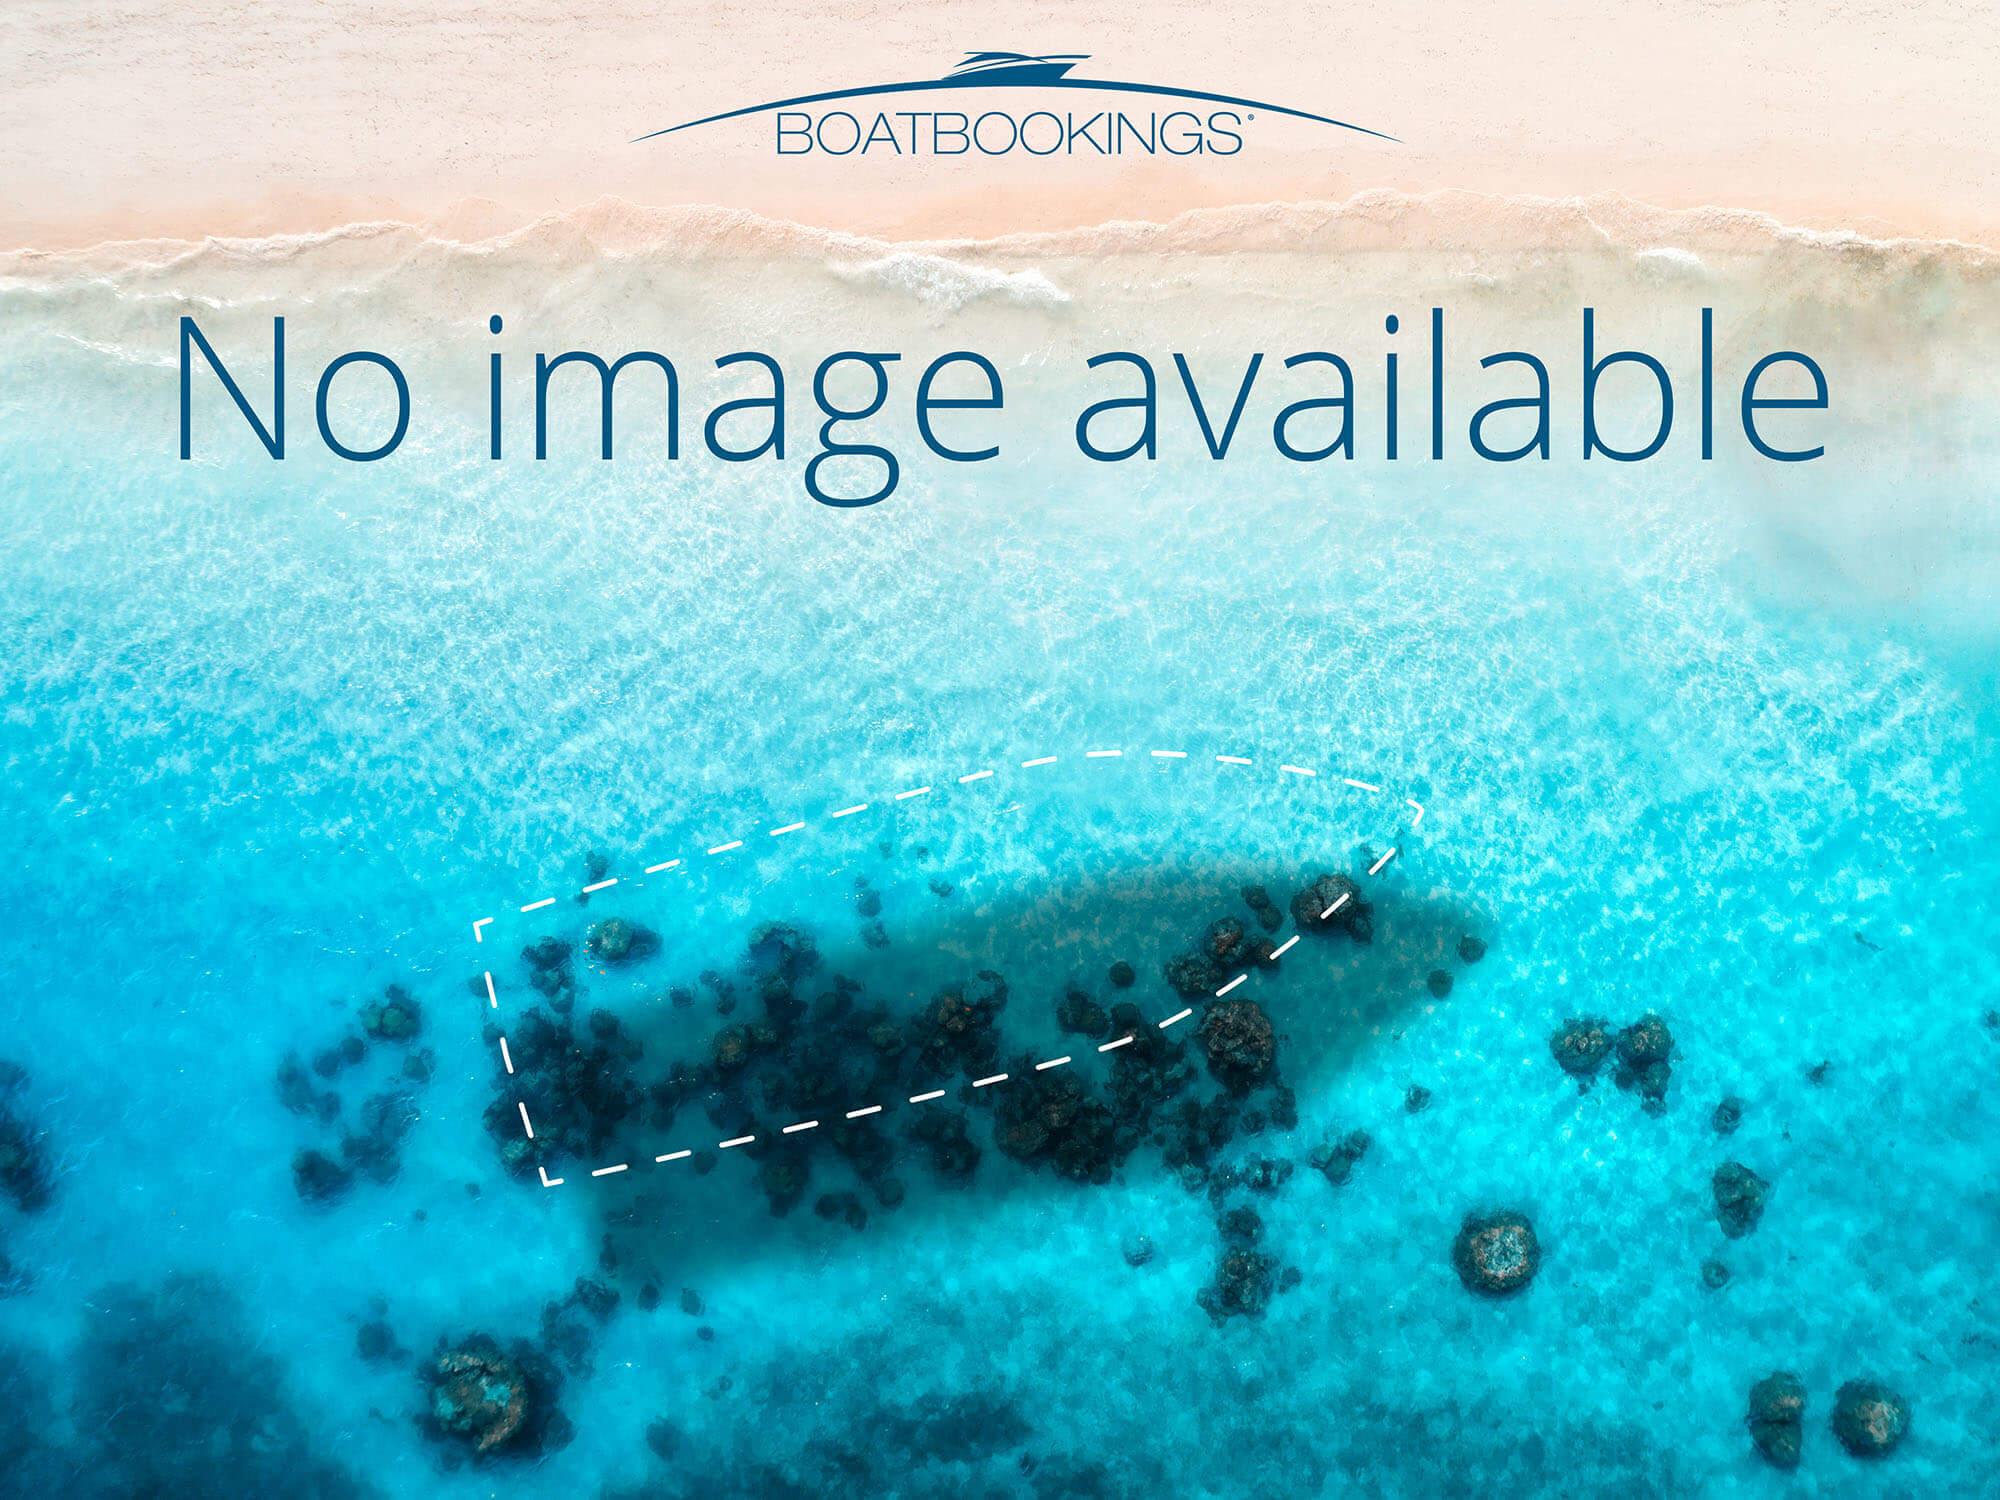 Charter Yacht AURA - Lagoon 42 - 2018 - 3 cabins (3 double) - Croatia - Dubrovnik - Split